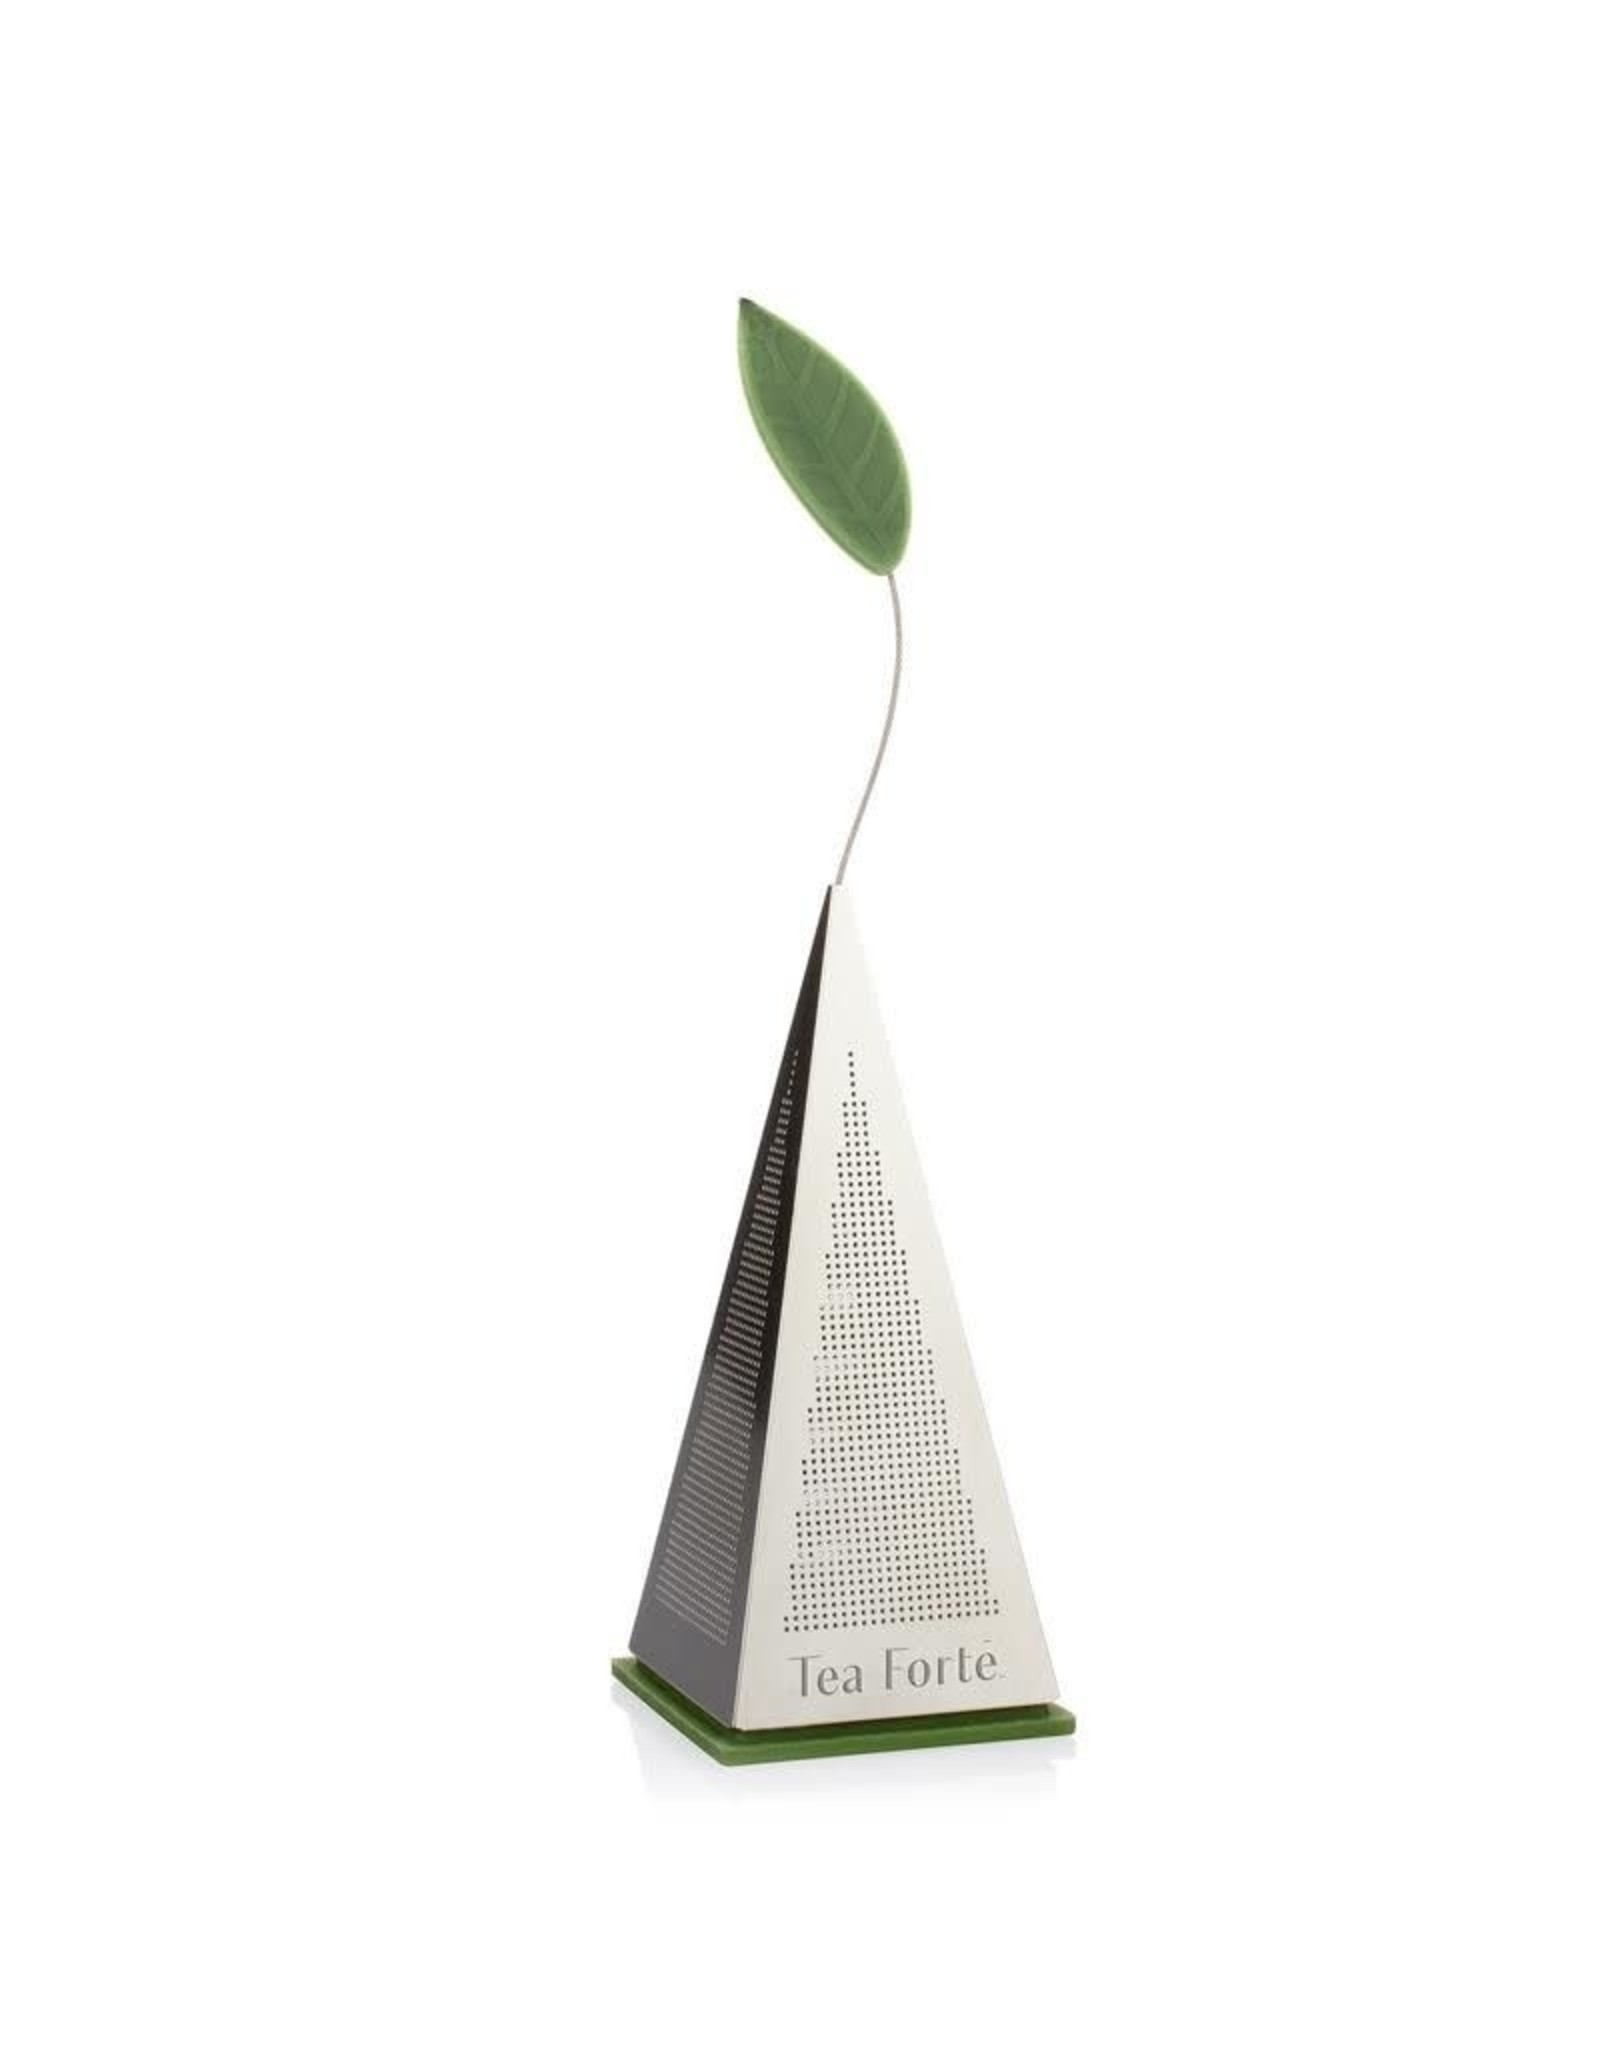 Tea Forte Tea Infuser